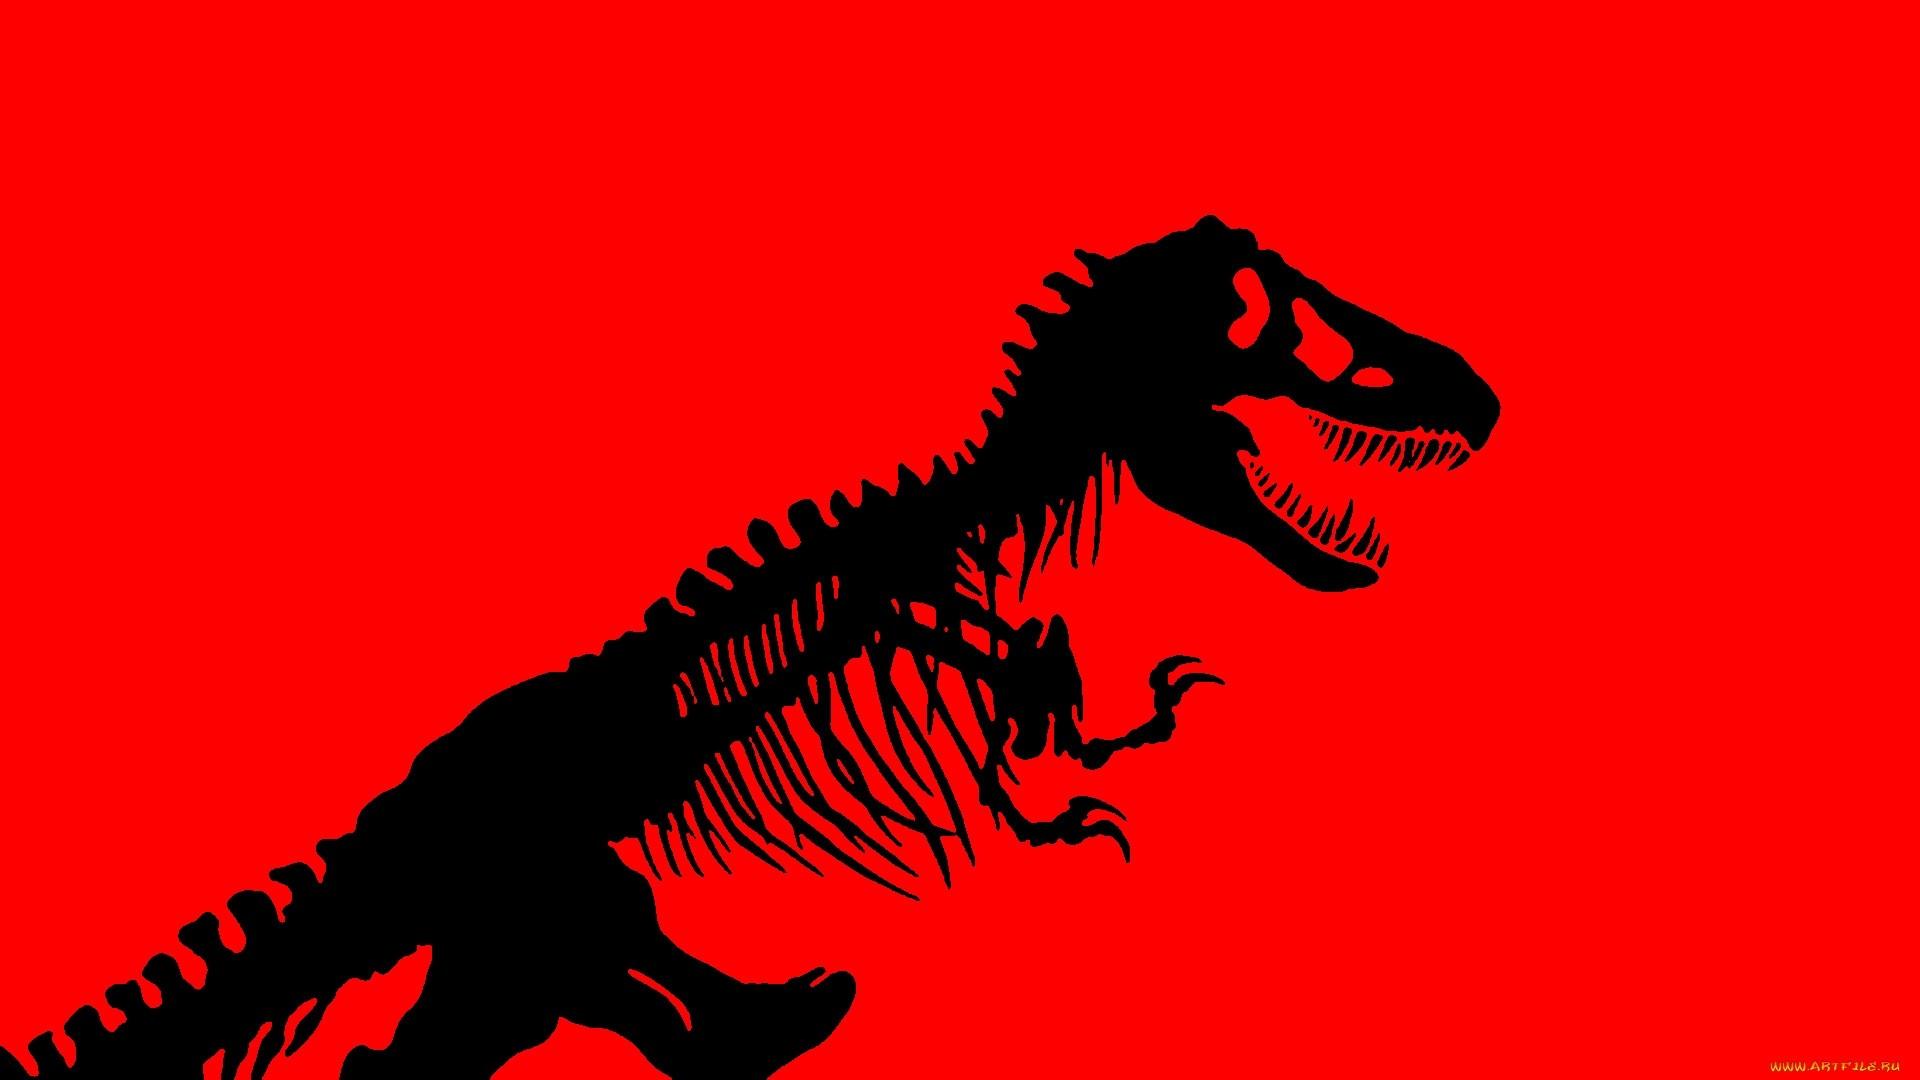 Minimalist Dinosaur Wallpaper Download Full